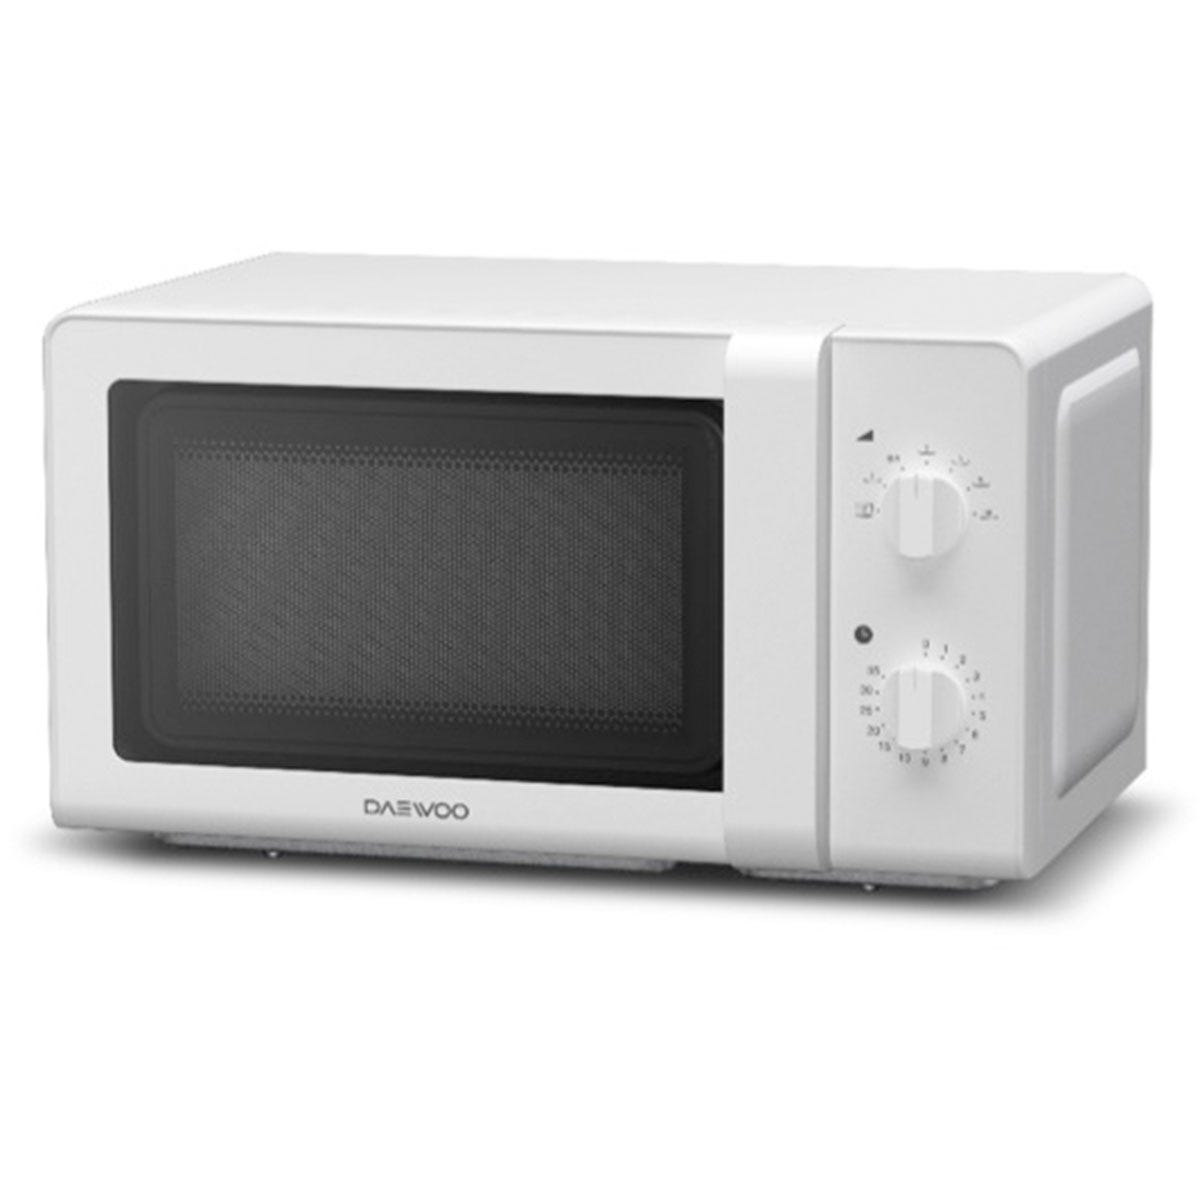 Daewoo KOR6M27R 800W Solo Manual Control 20L Microwave - White